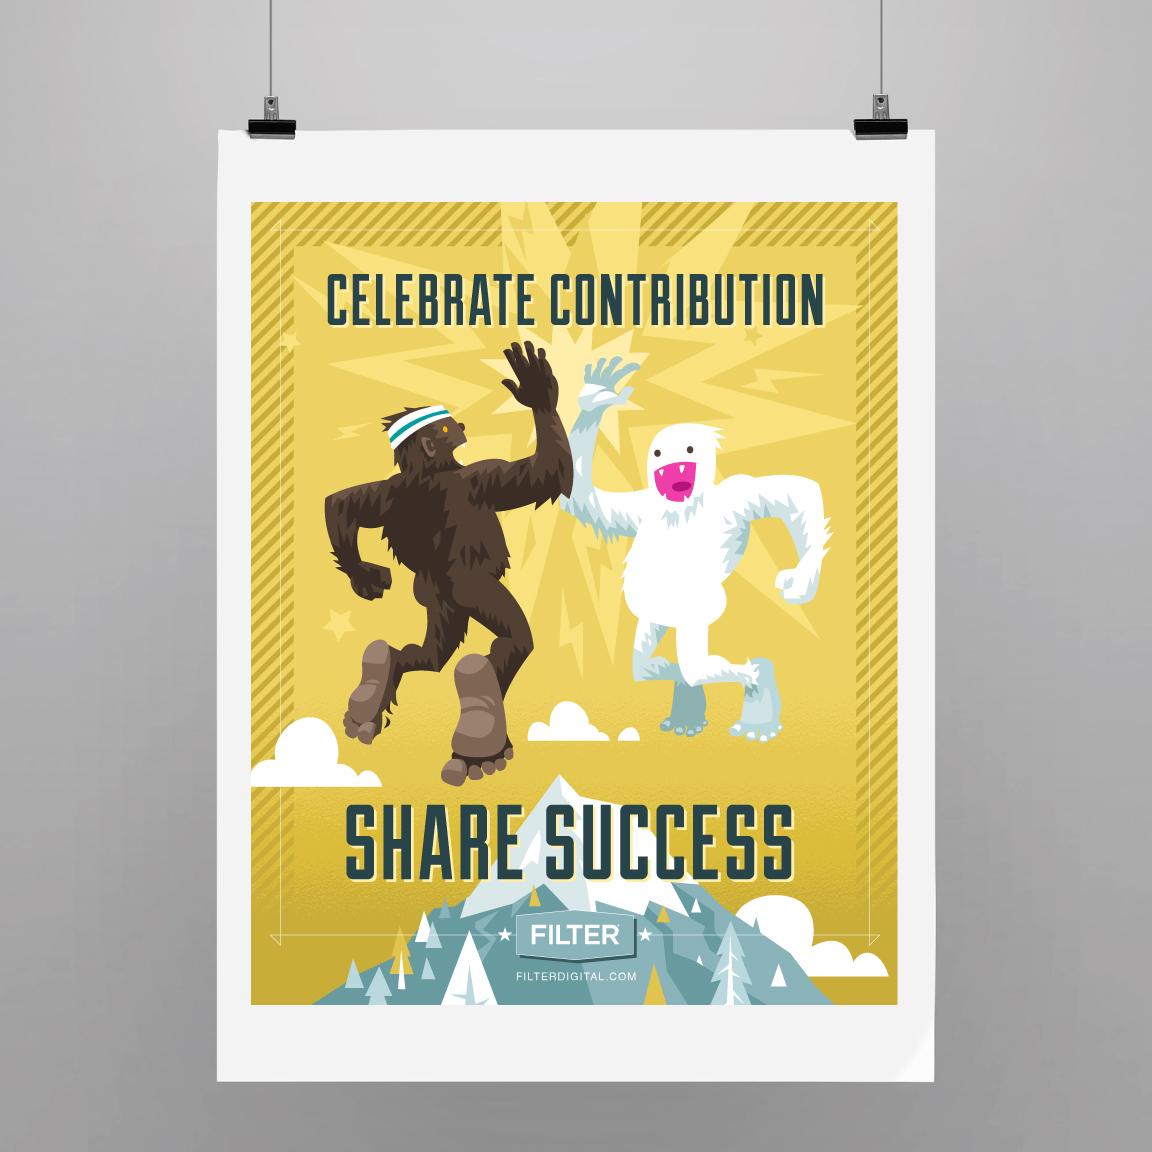 Celebrate contribution. Share success.